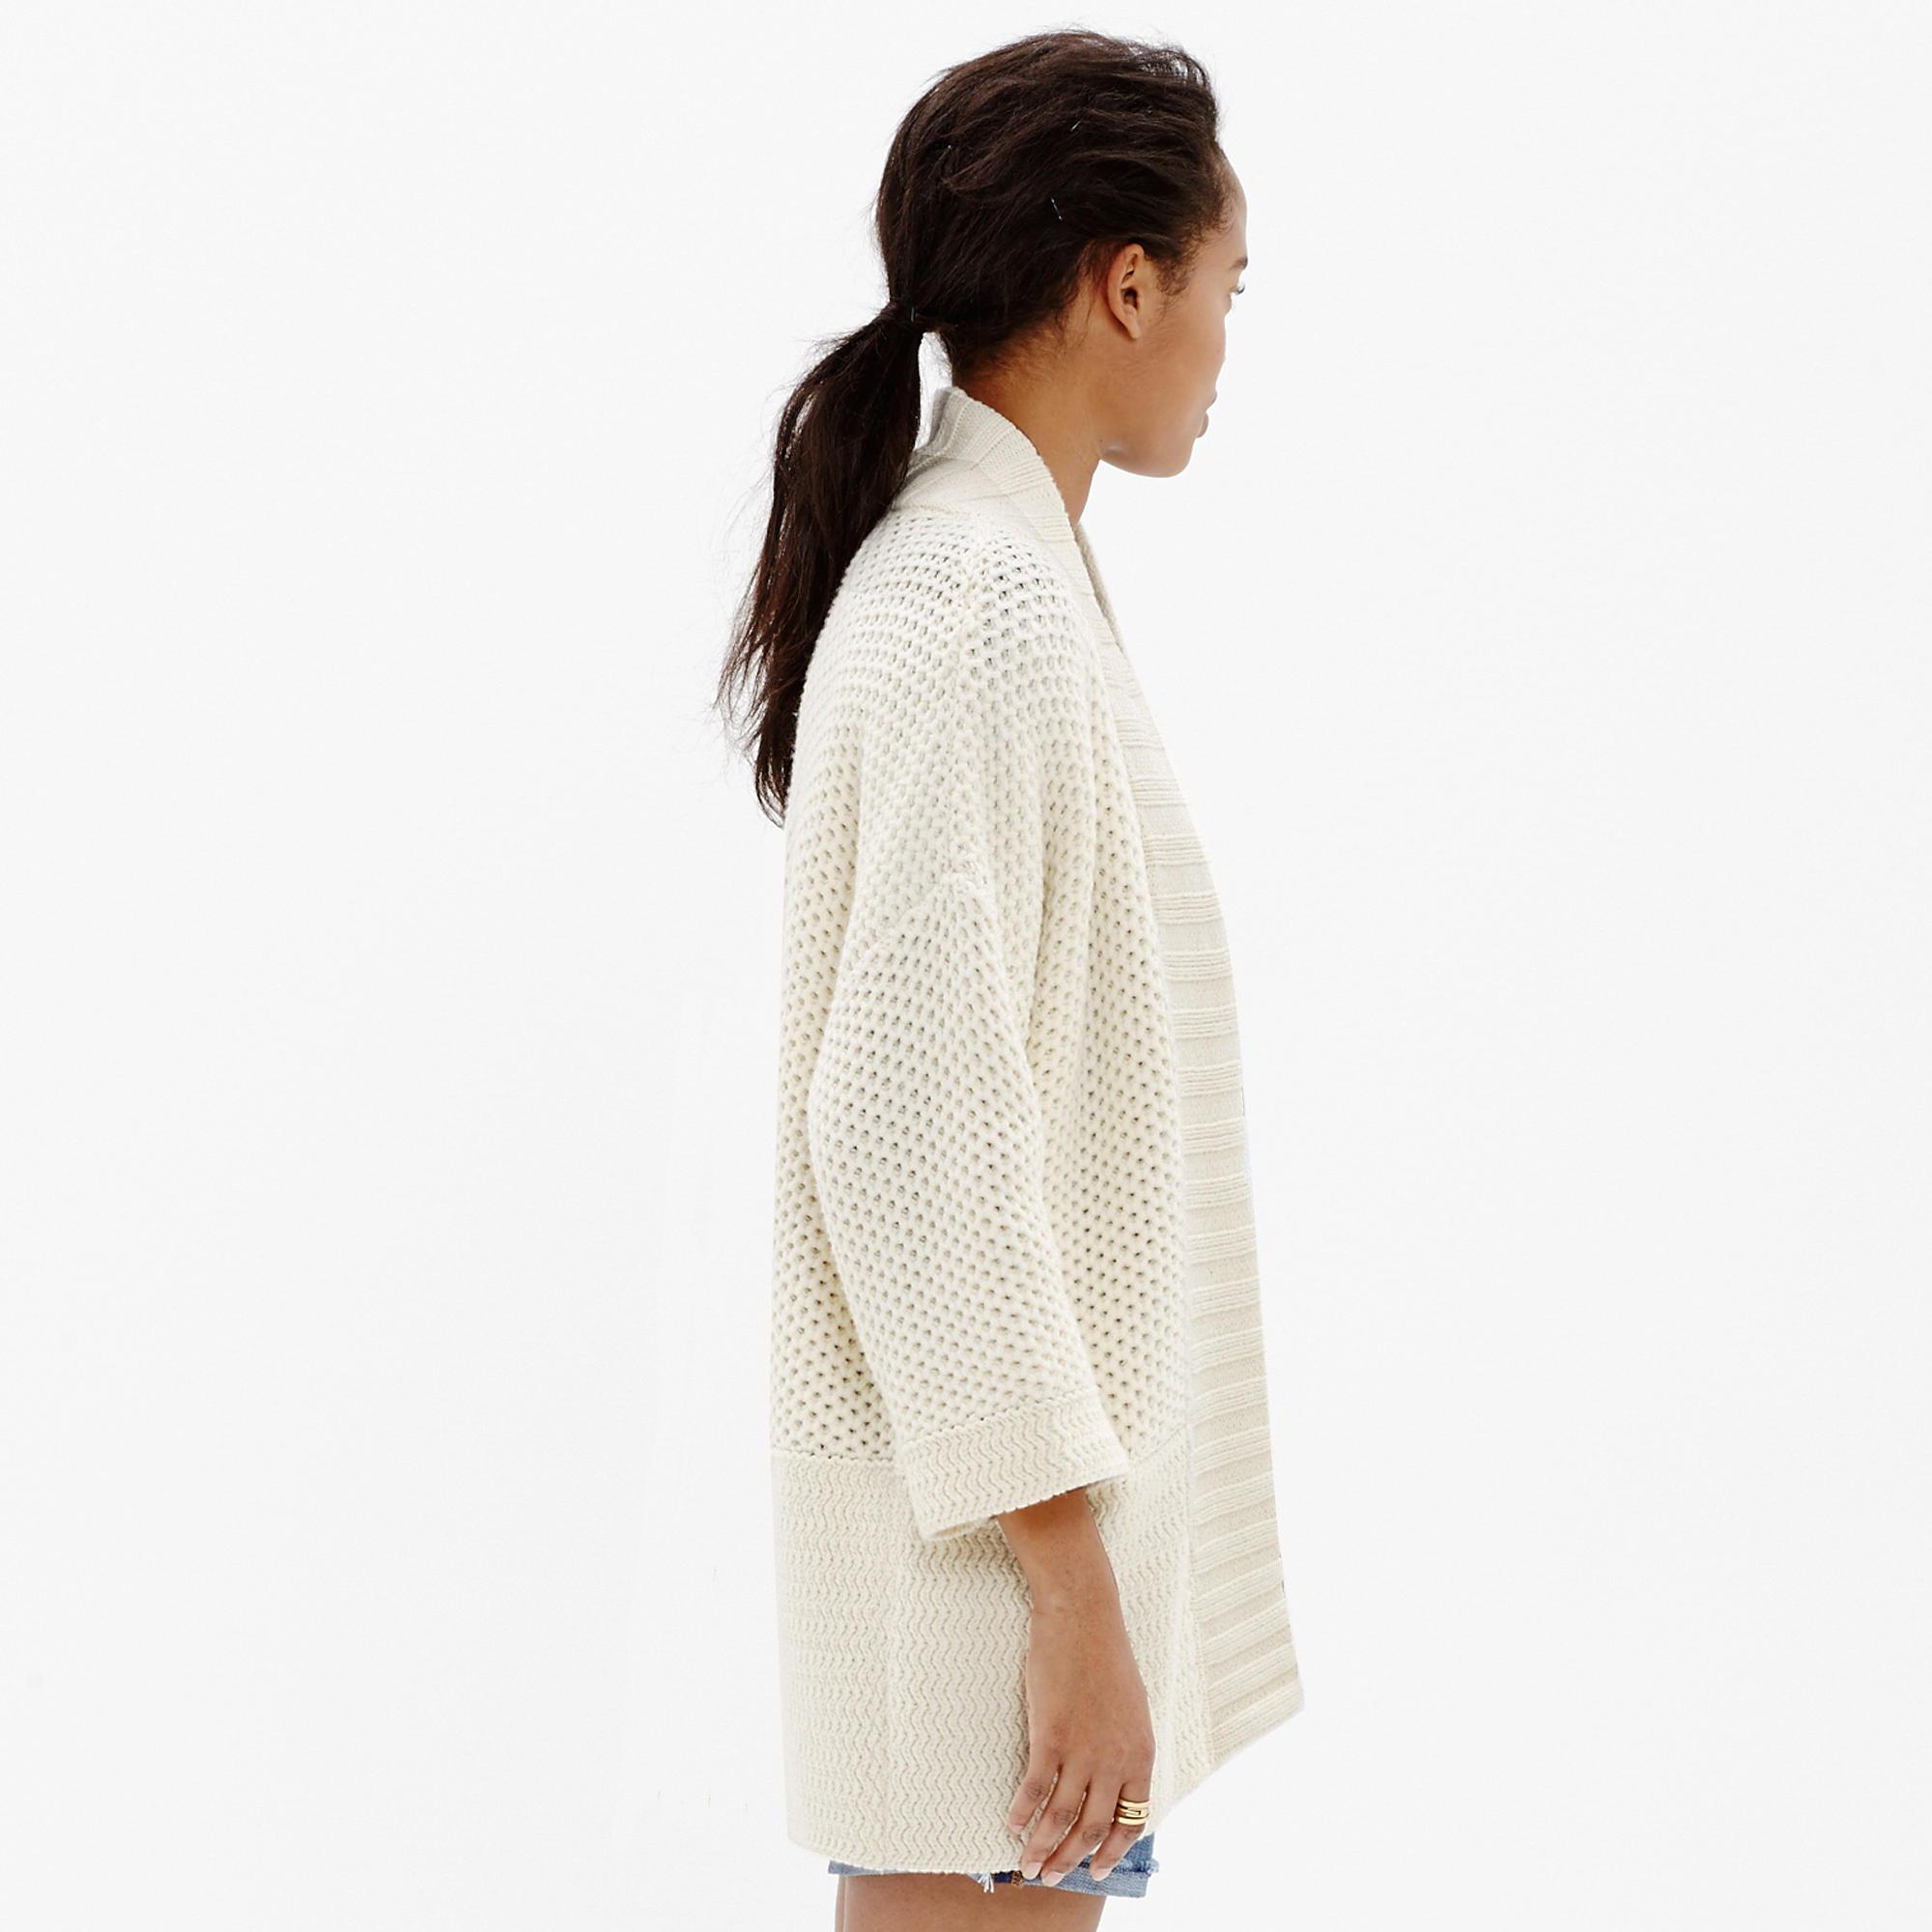 Kimono Cardigan Sweater : cardigans & sweater-jackets | Madewell